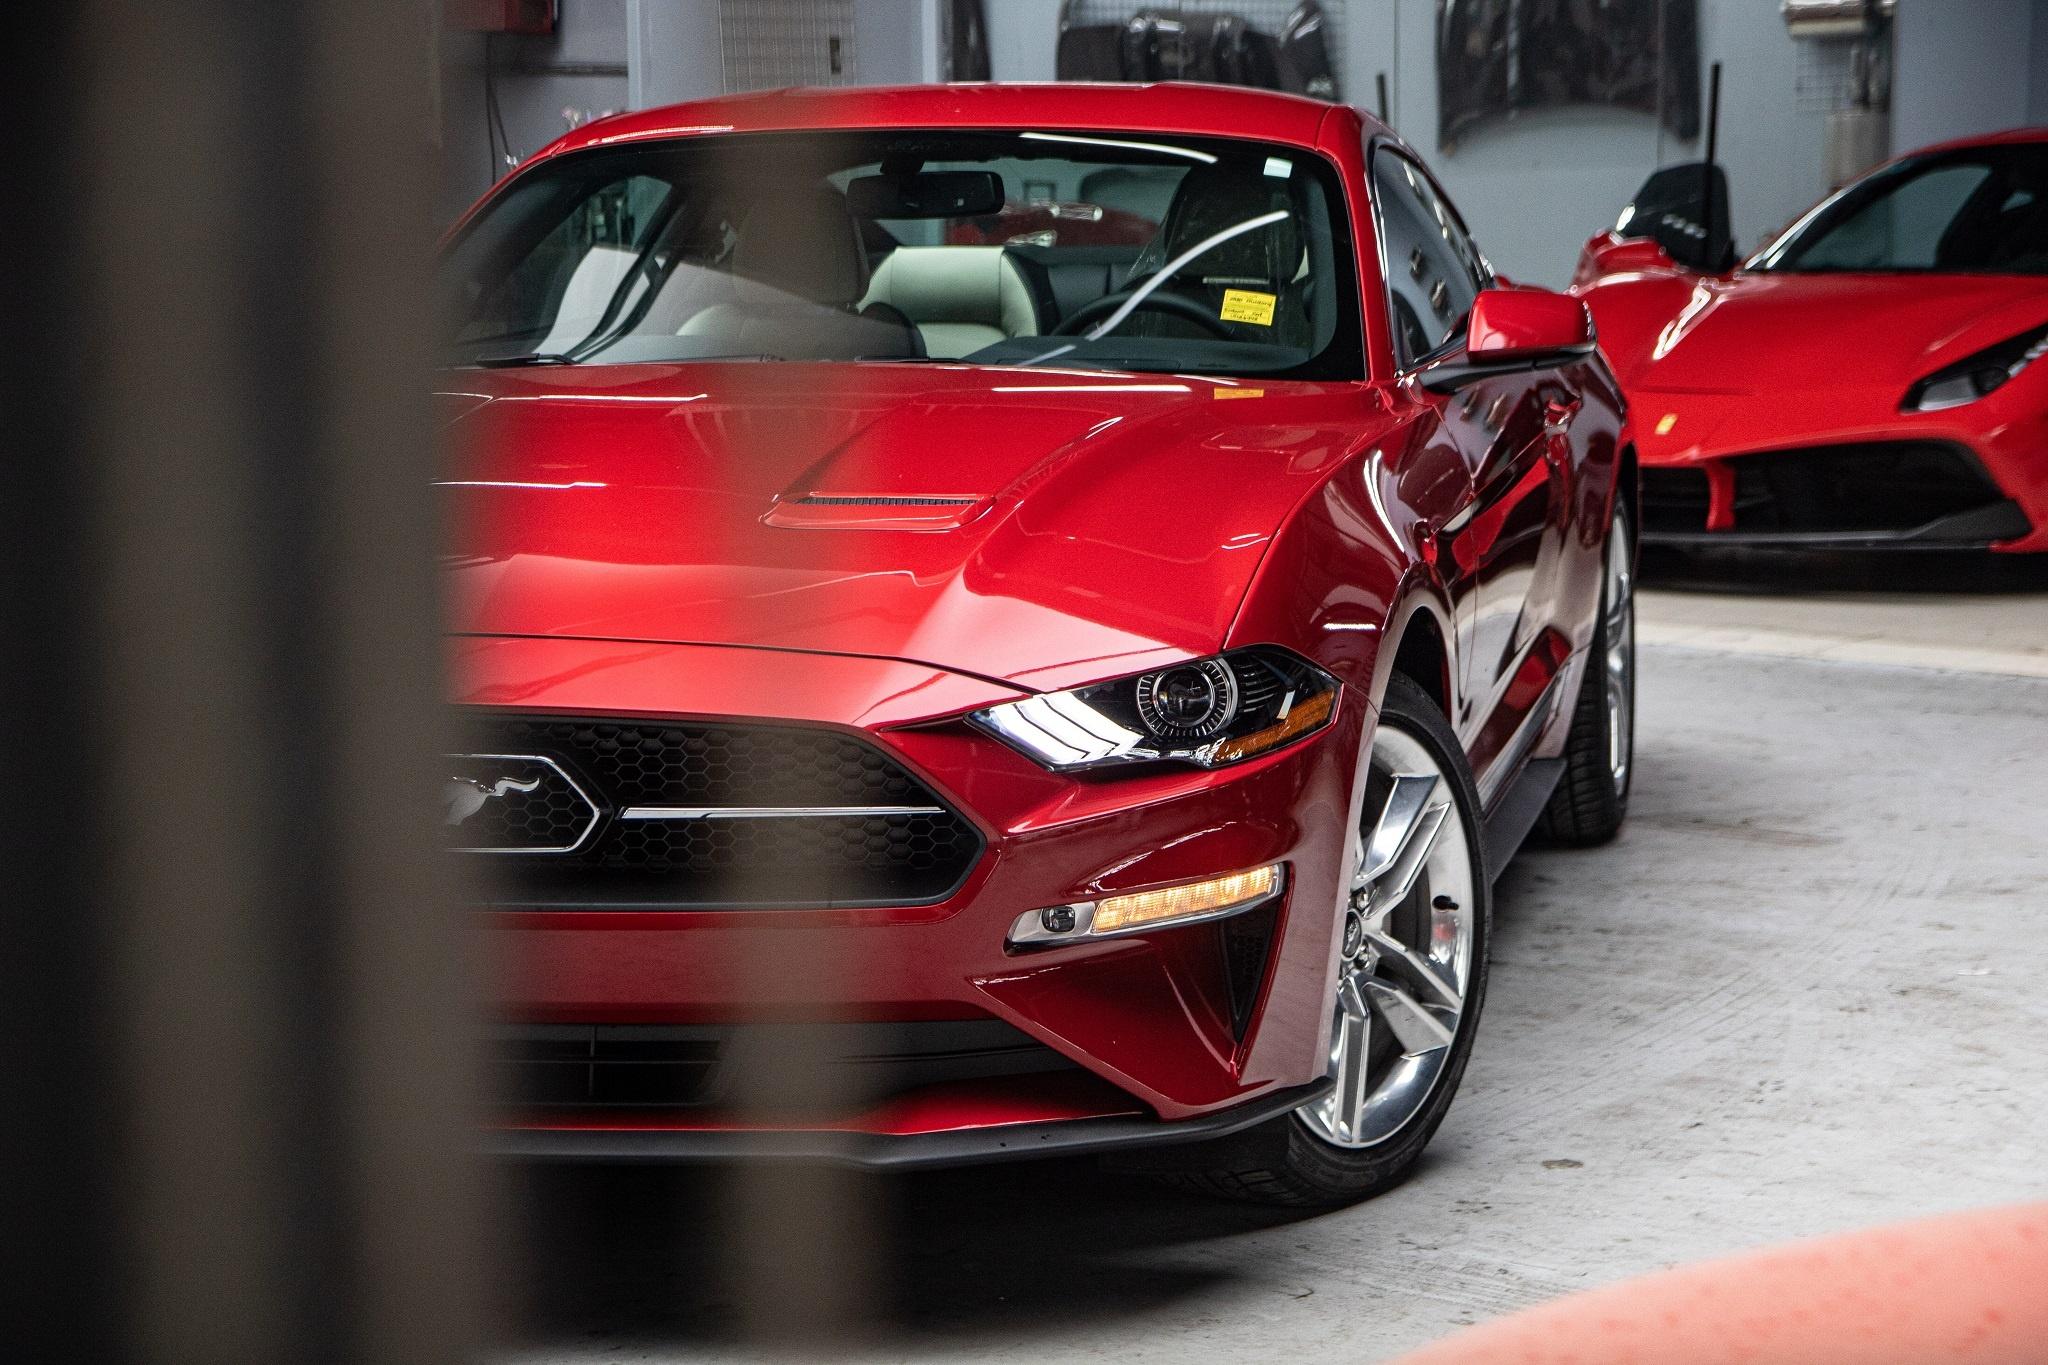 Ford Mustang 2020 phien ban ky niem vua ve VN, gia hon 3 ty hinh anh 13 Mustang_55_edition_zing_9_.jpg